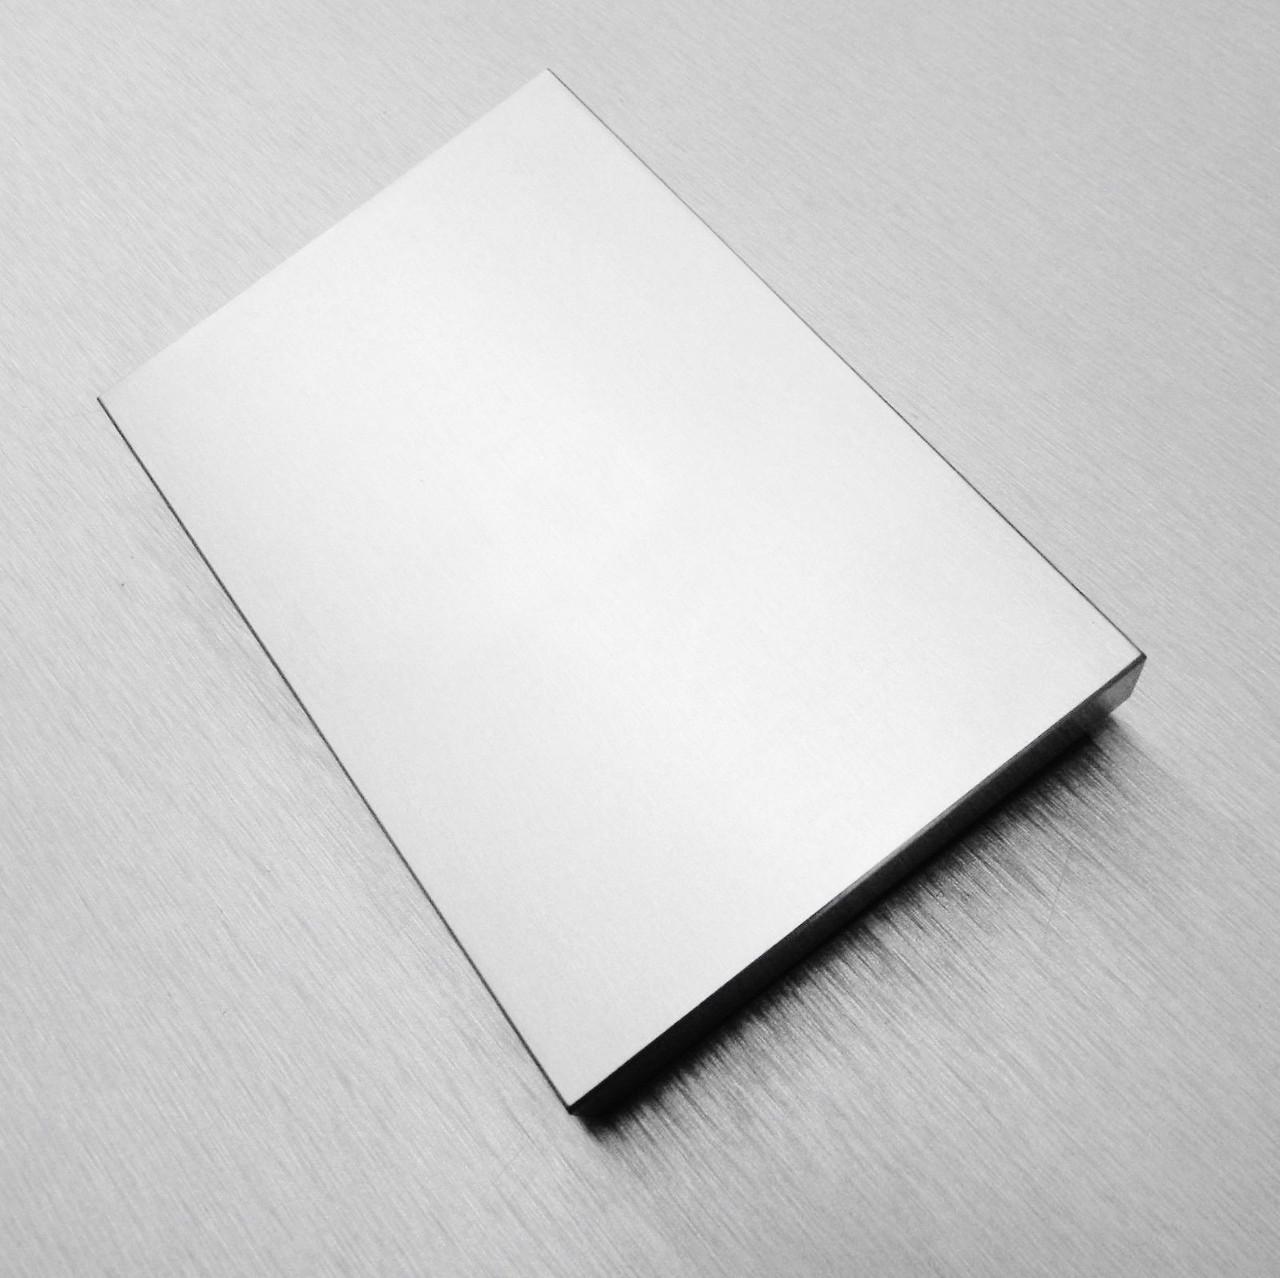 4x6 Steel Bench Block Jewelers Block Hardened Metal Working Forming Flat Anvil